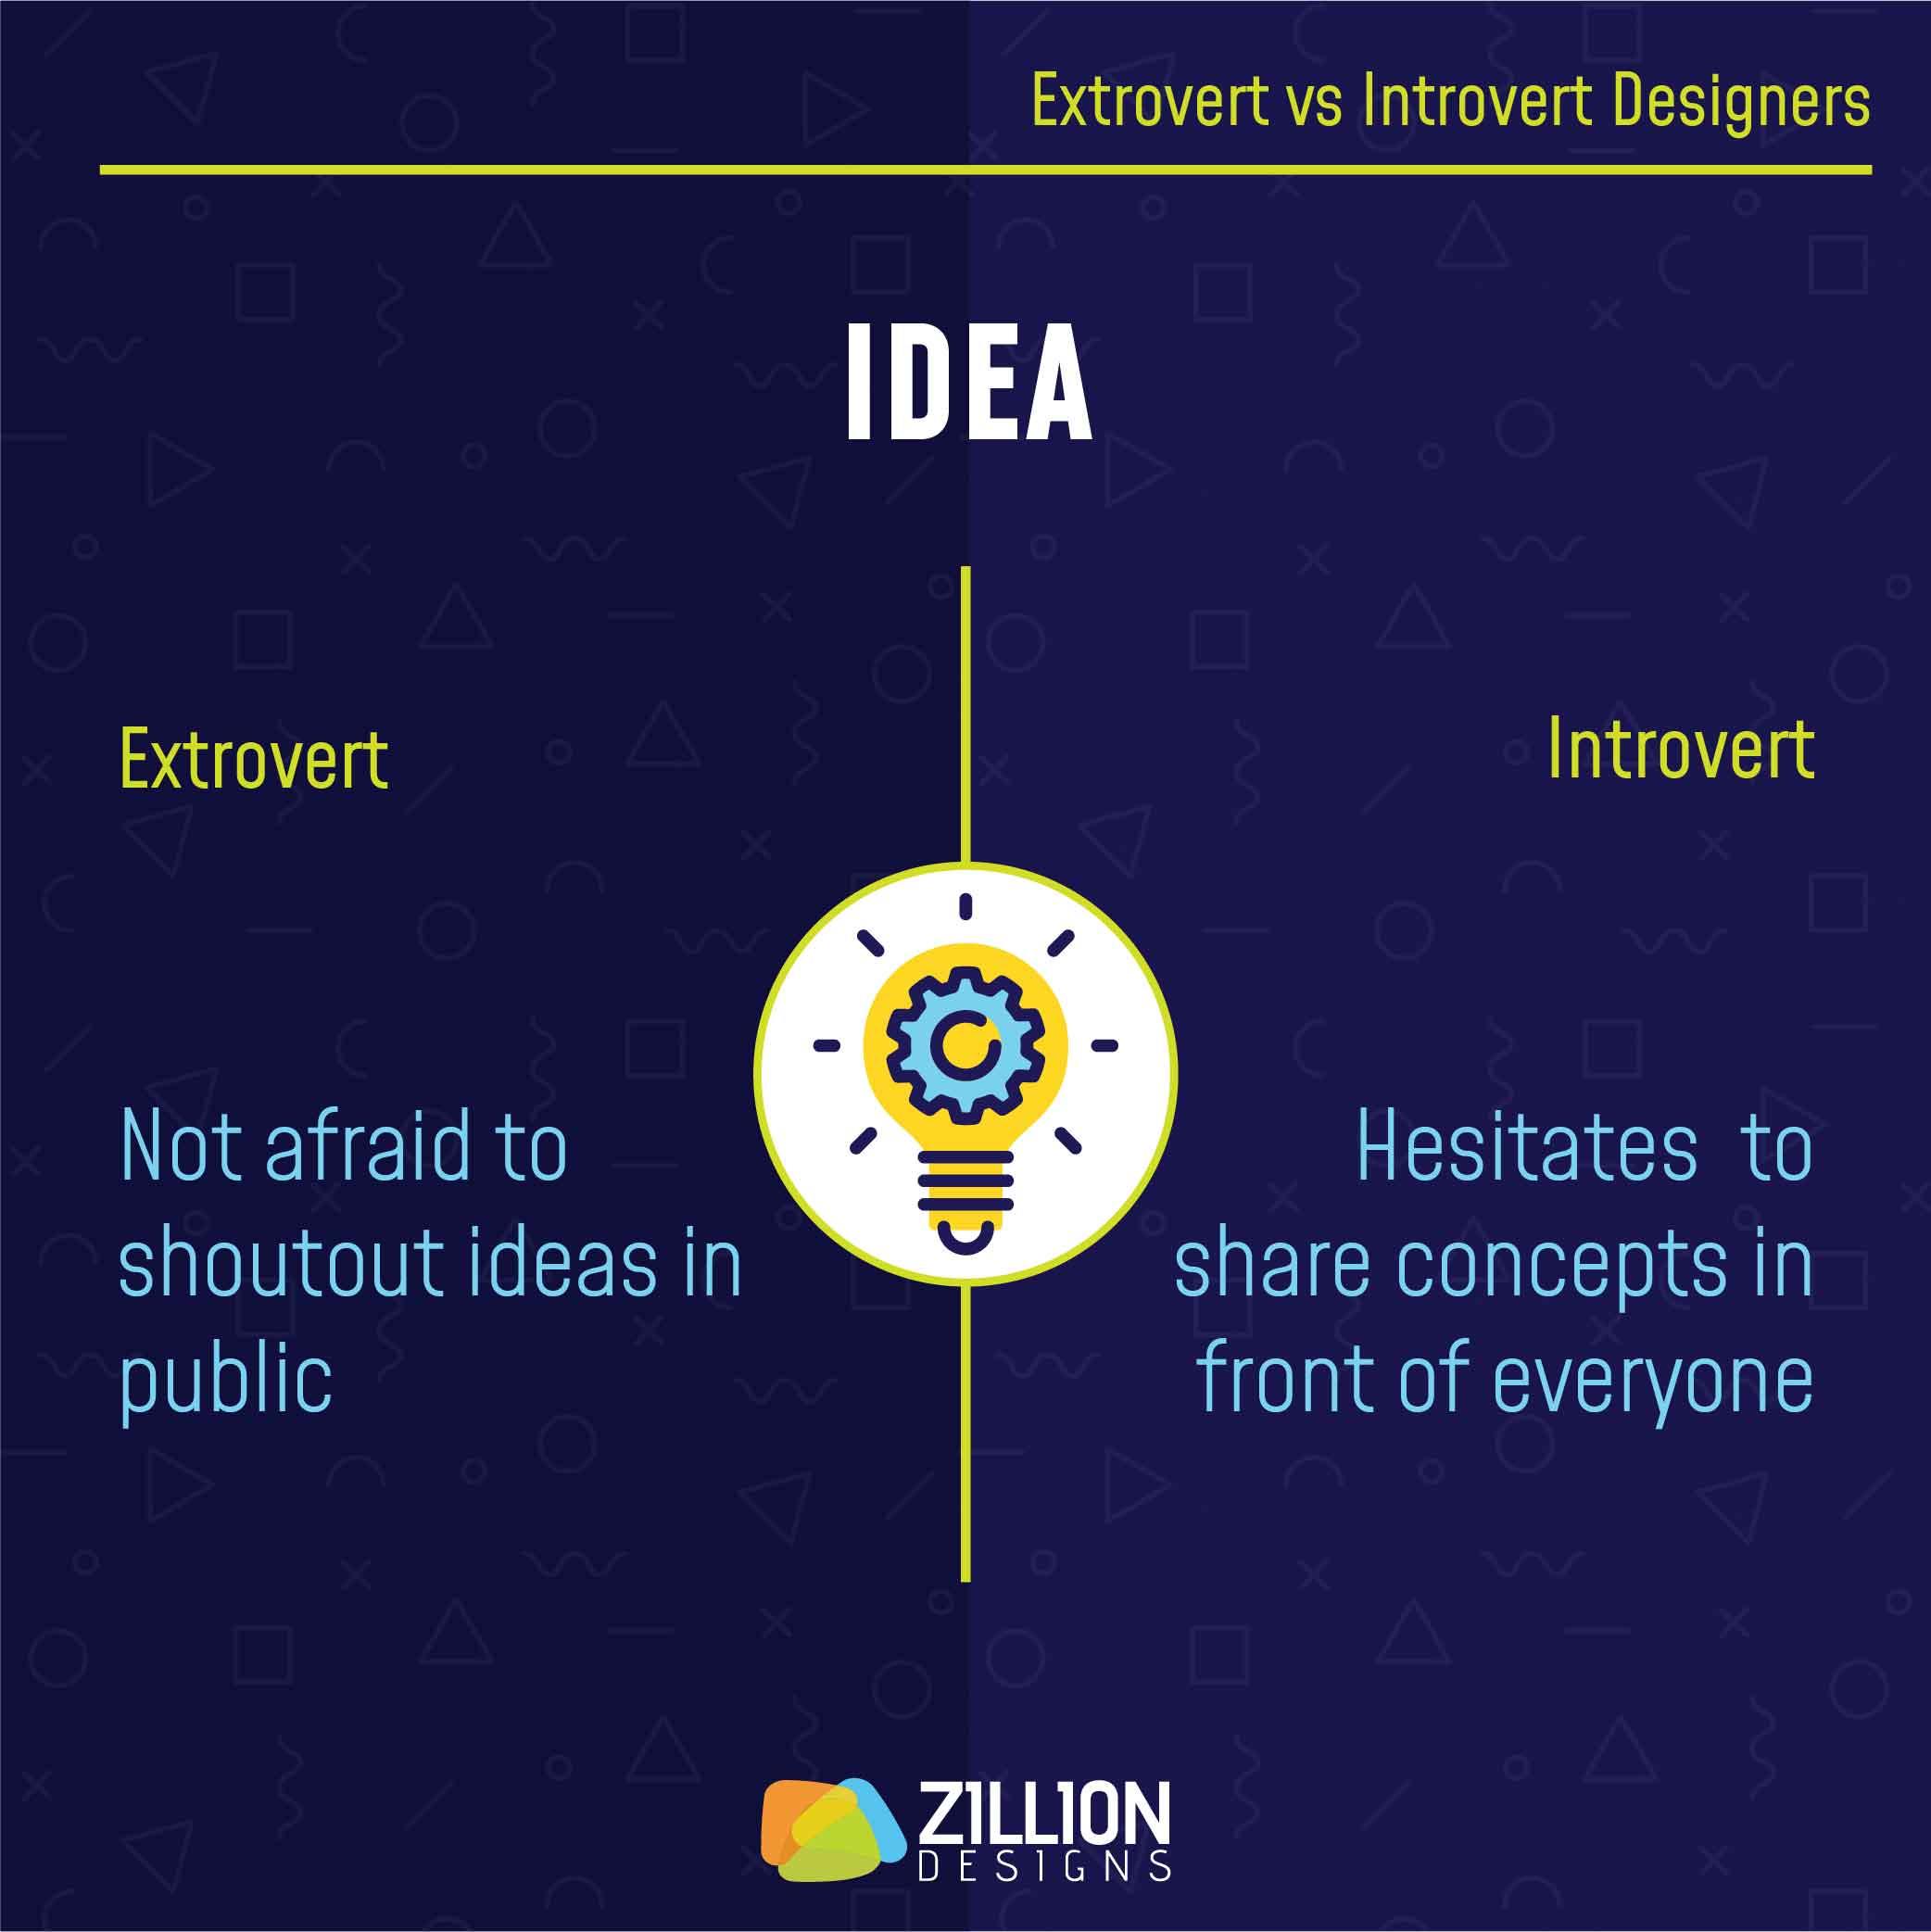 Extrovert vs Introvert Designers 2